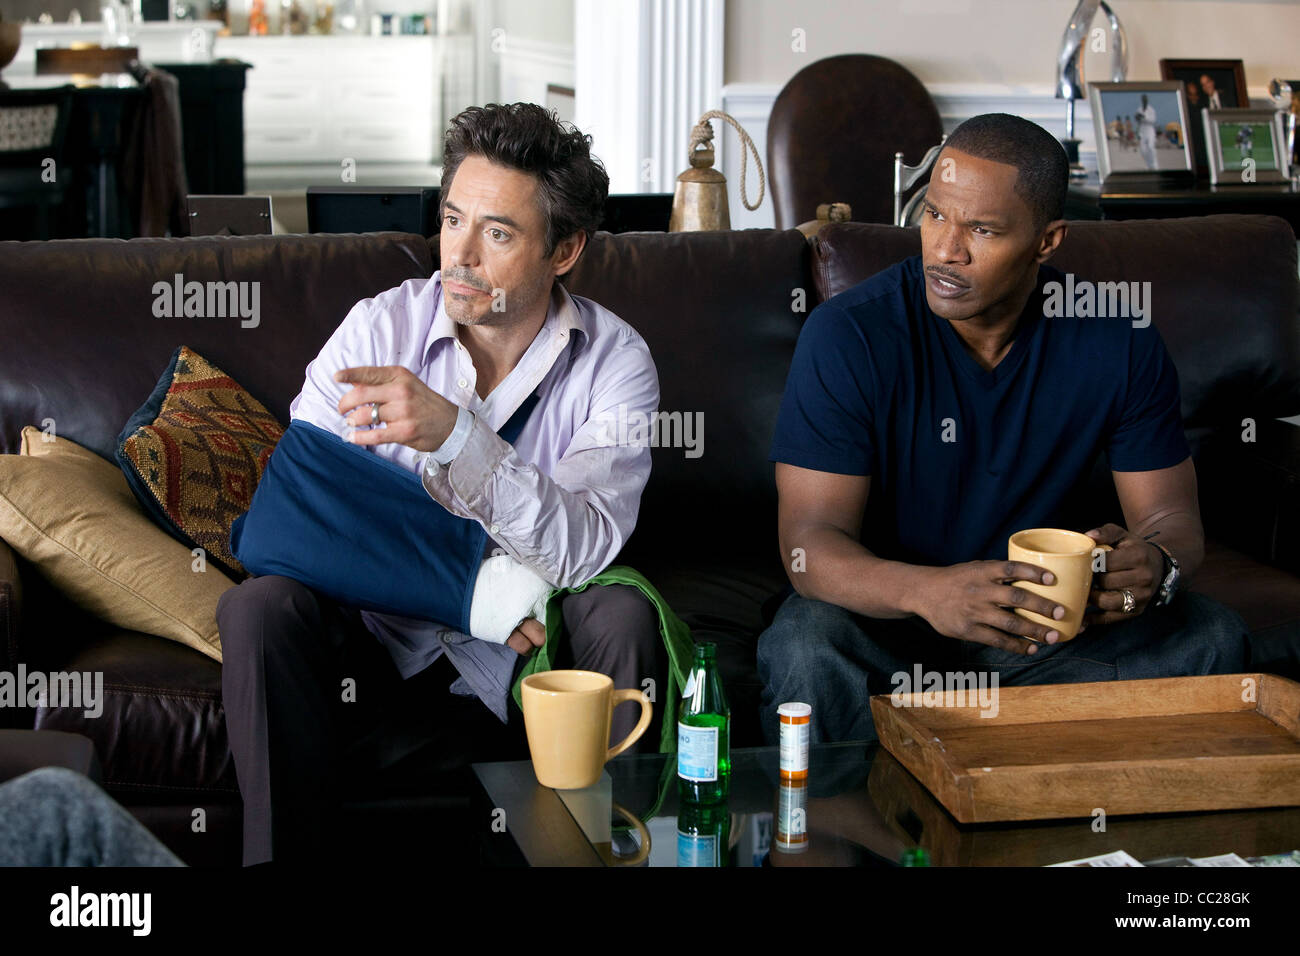 Robert Downey Jr Jamie Foxx Due Date 2010 Stock Photo Alamy